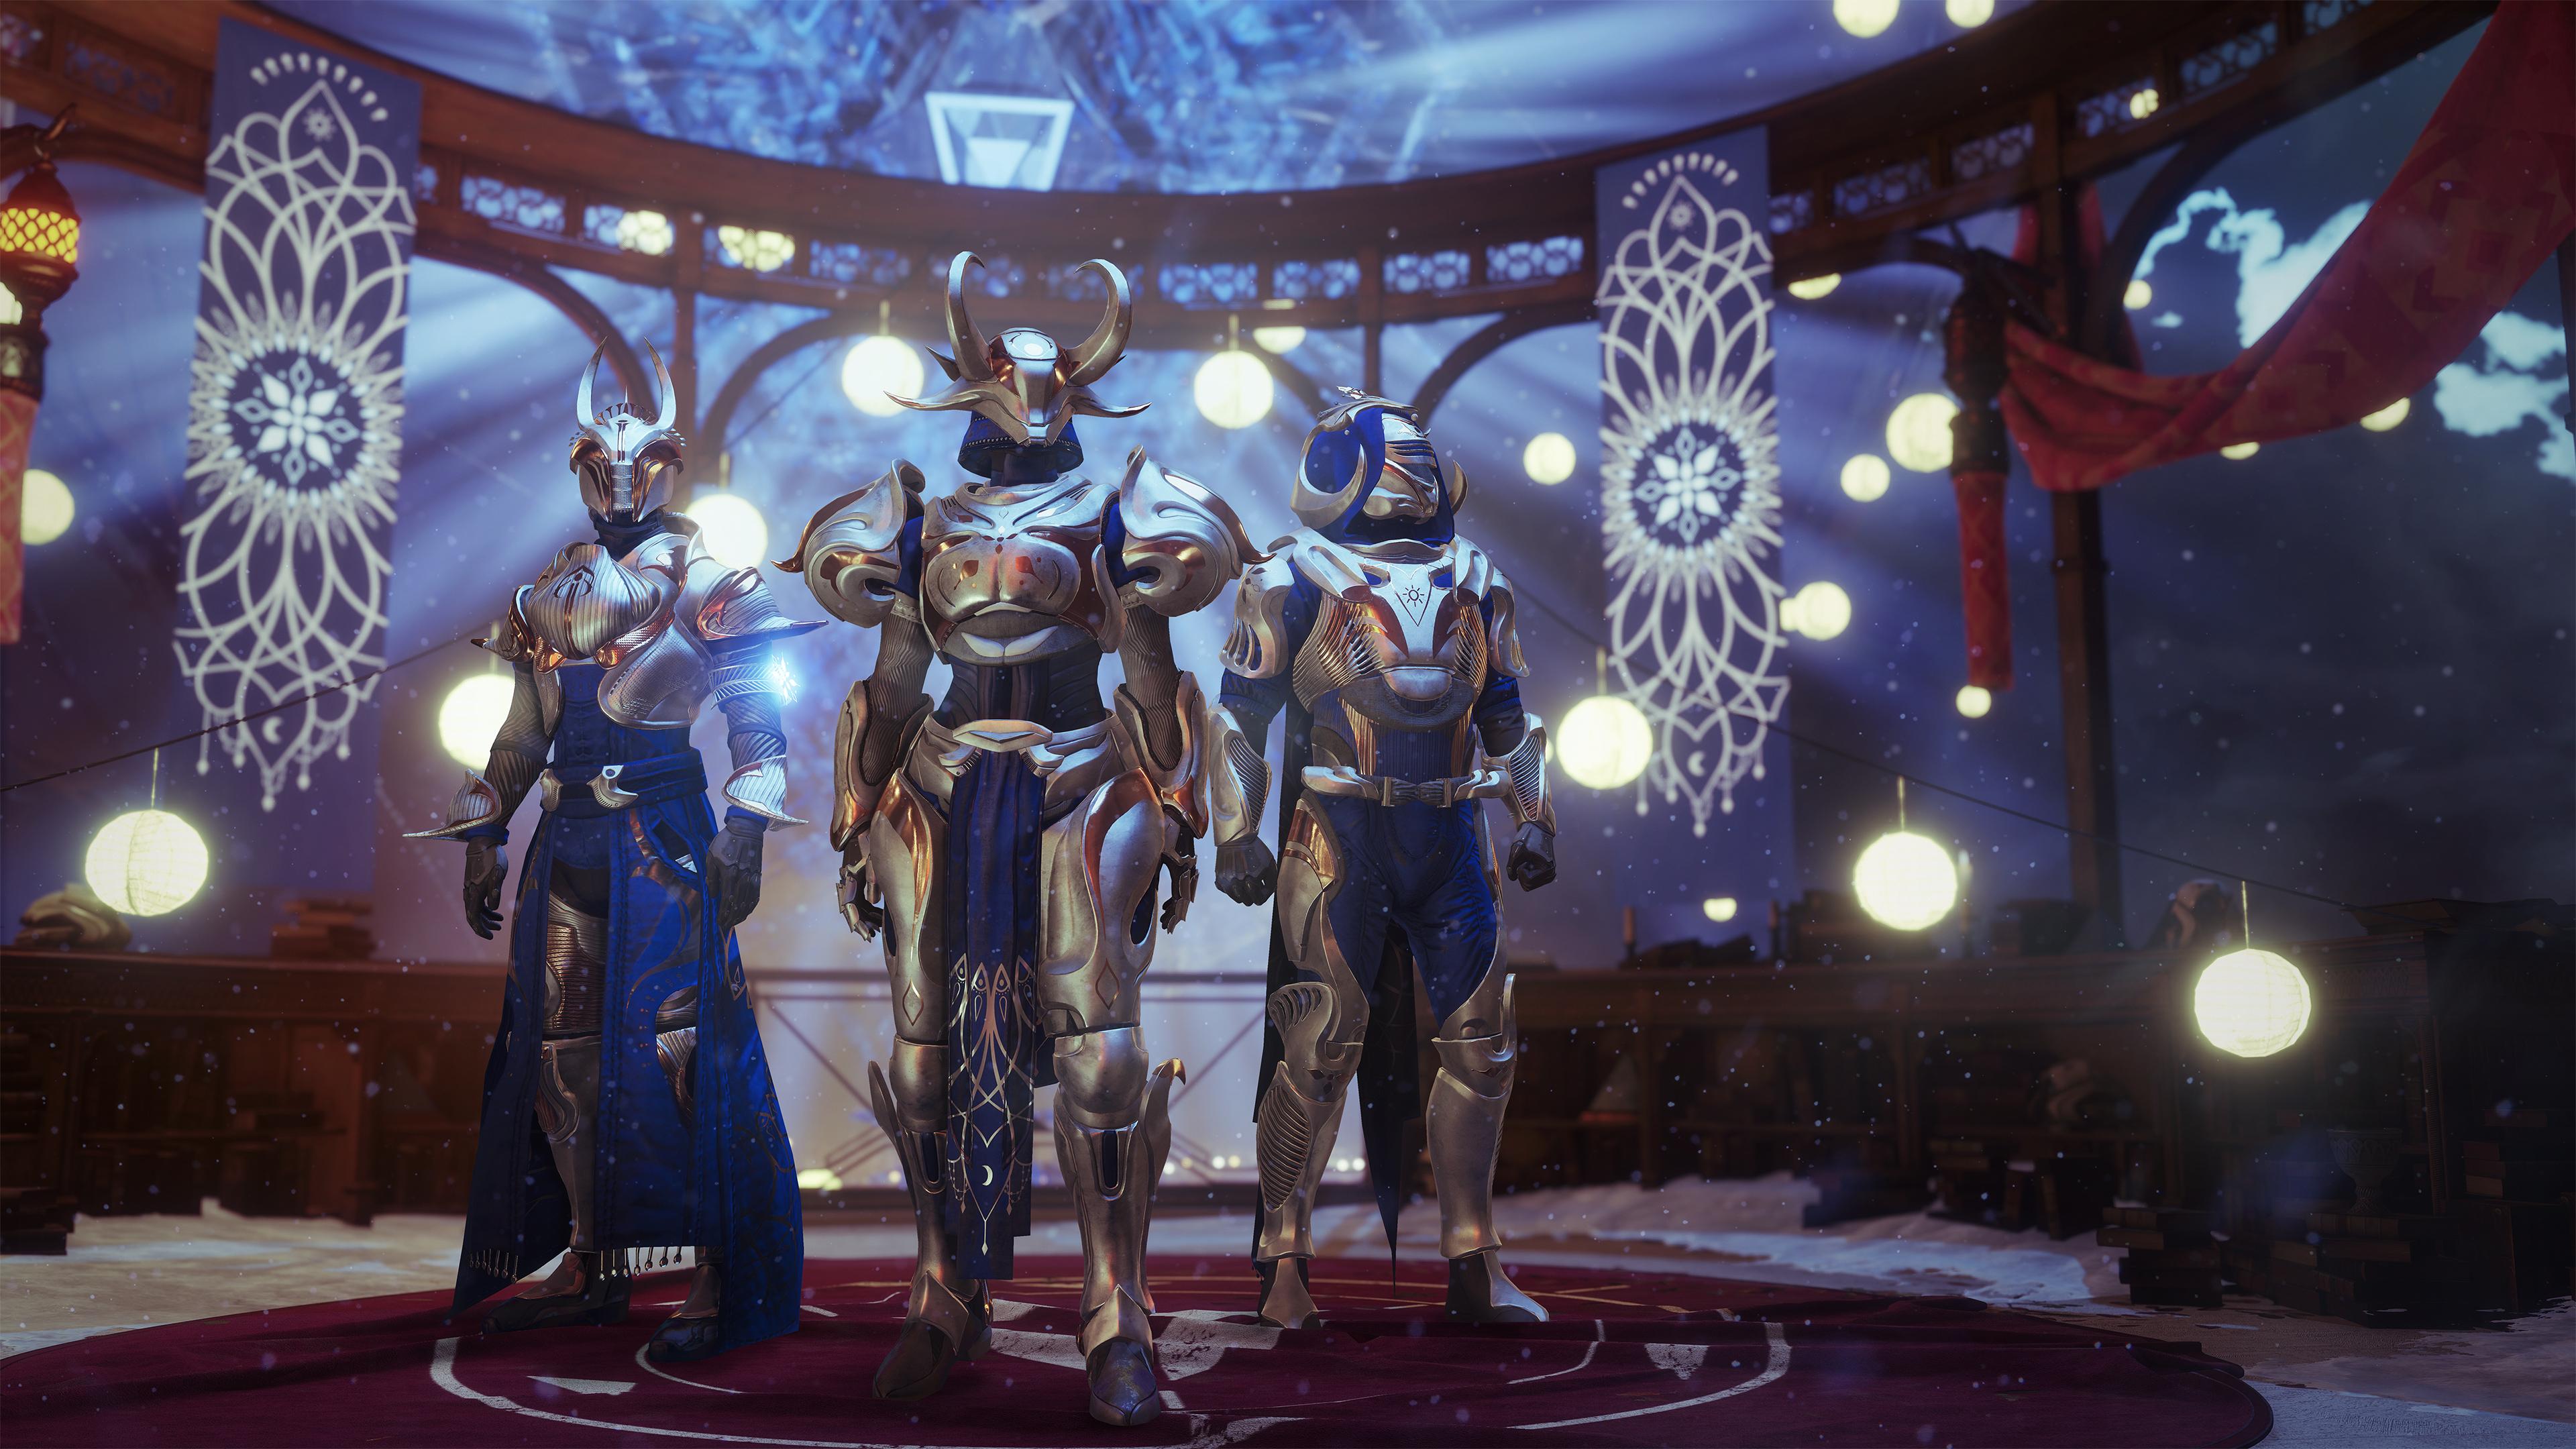 Destiny 2 - three Guardians wearing The Dawning armor